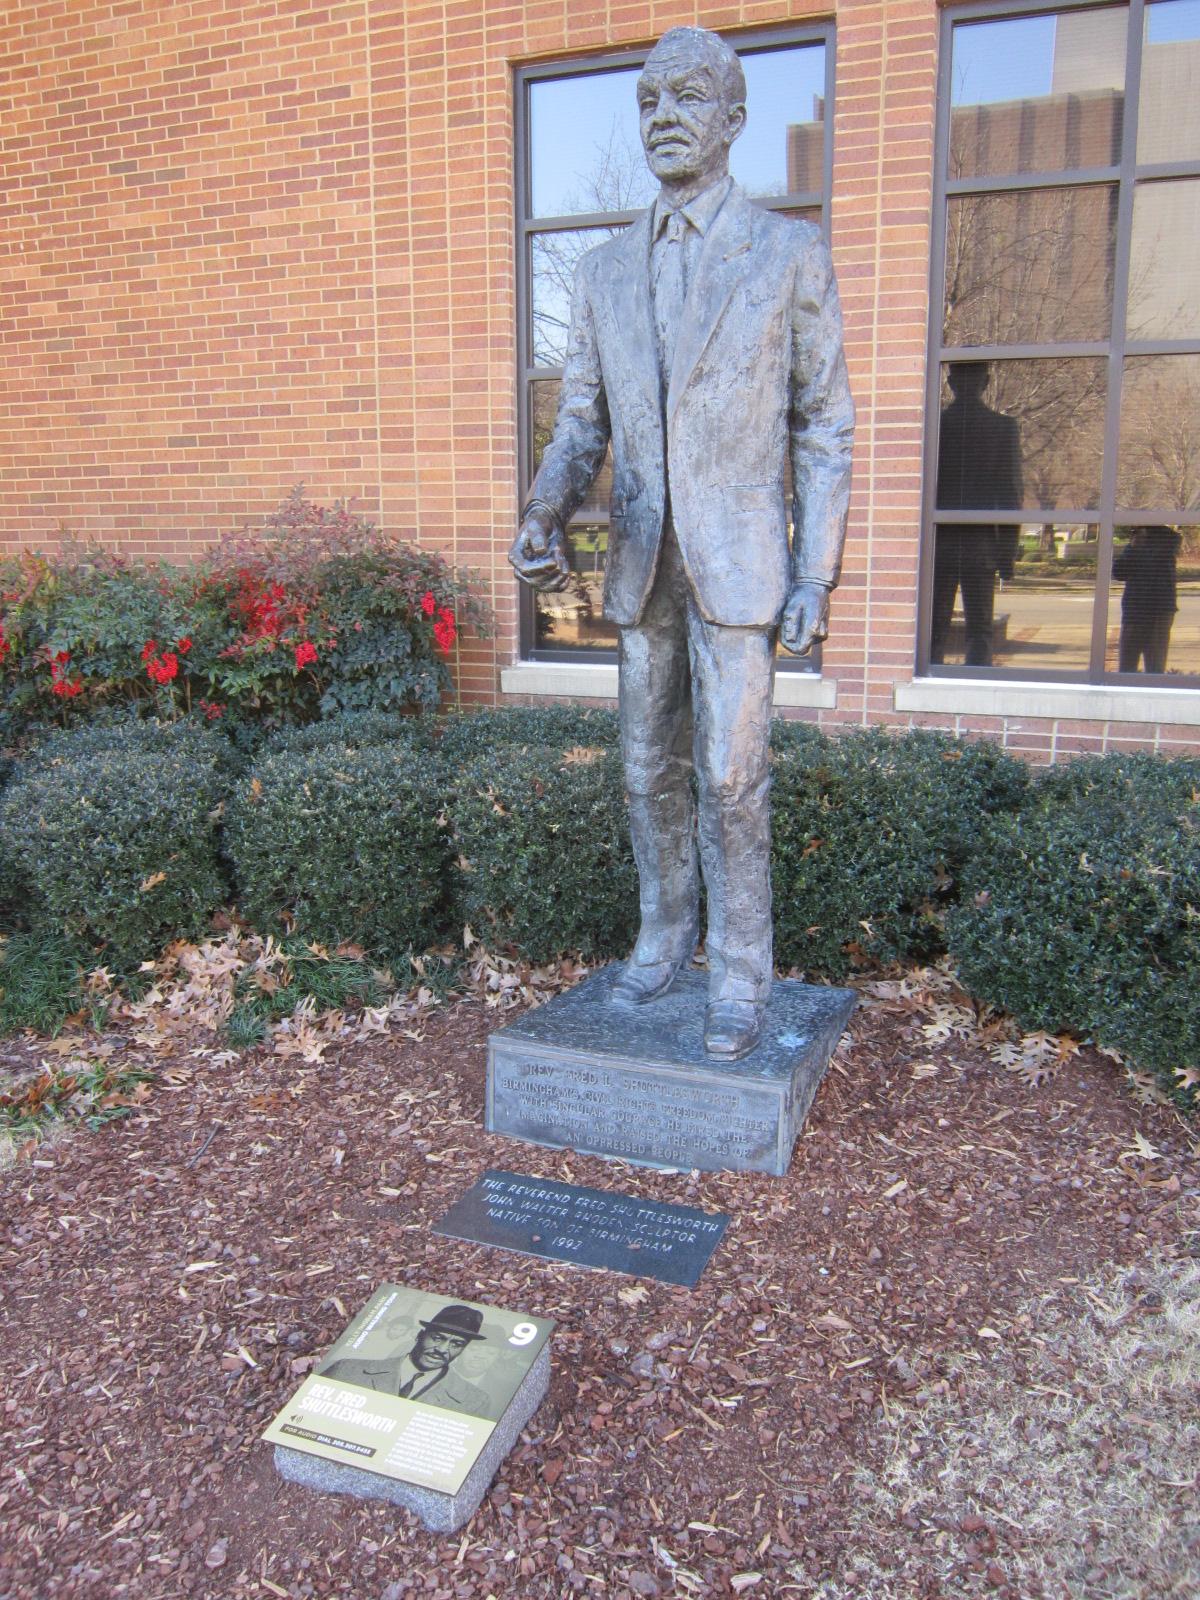 Statue Rev. Fred Shuttlesworth at Civ Rts Institute.JPG